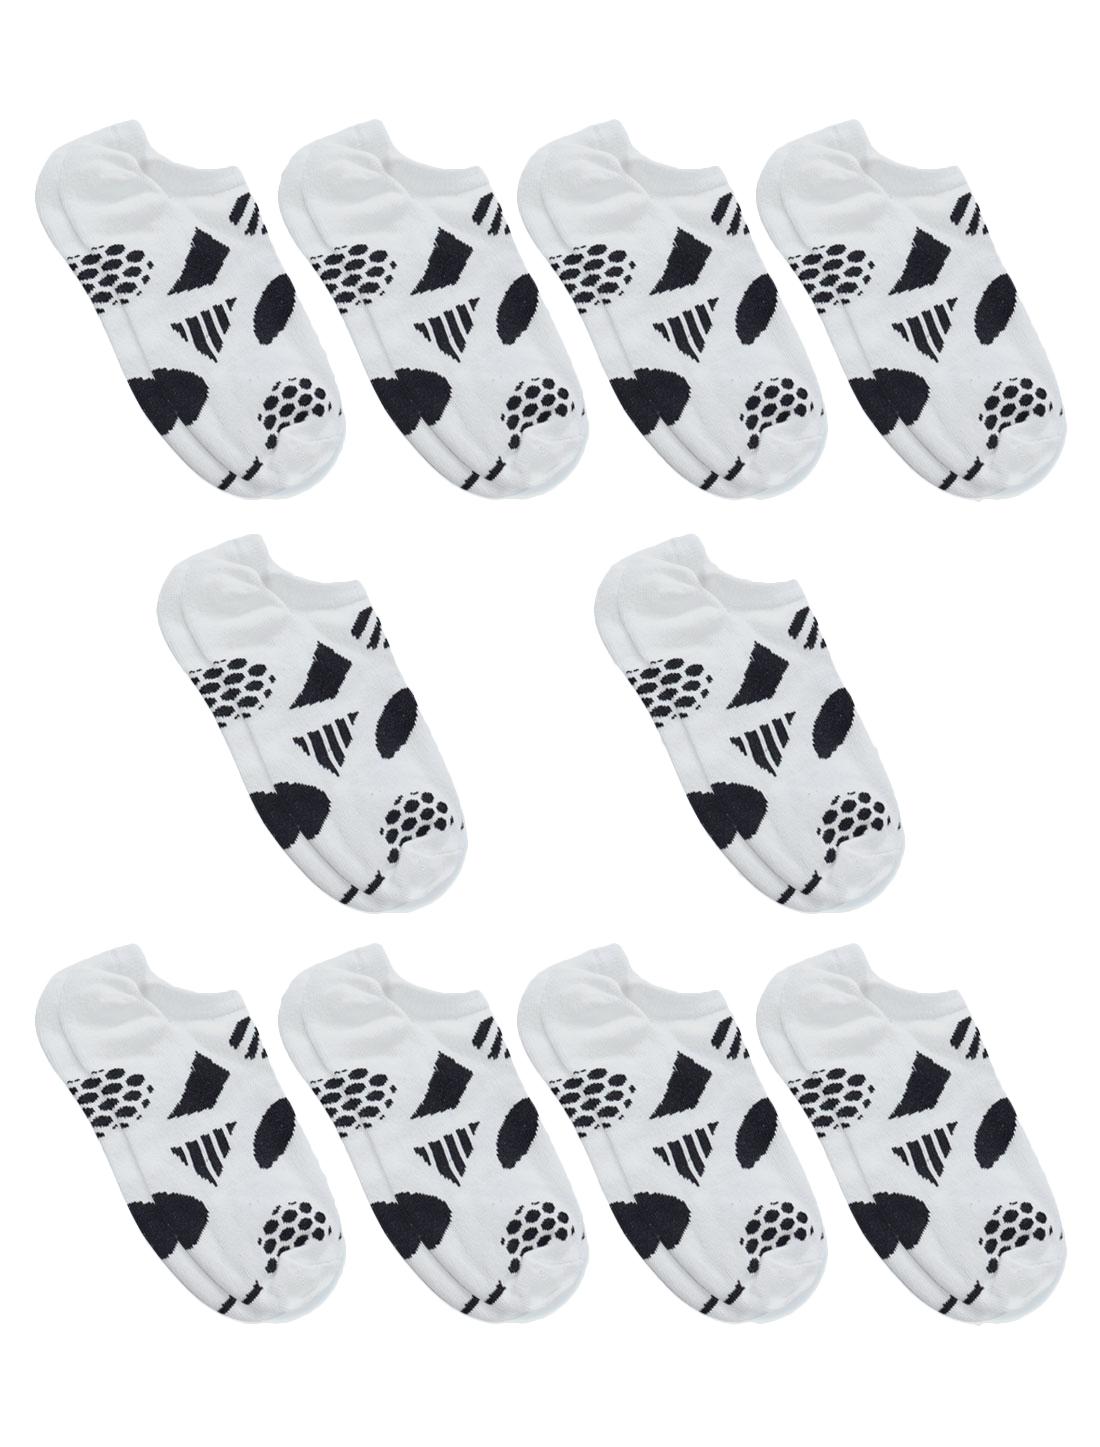 Women Low Cut Geometric Print Ankle Length Short Socks 10 Pairs White 9-11